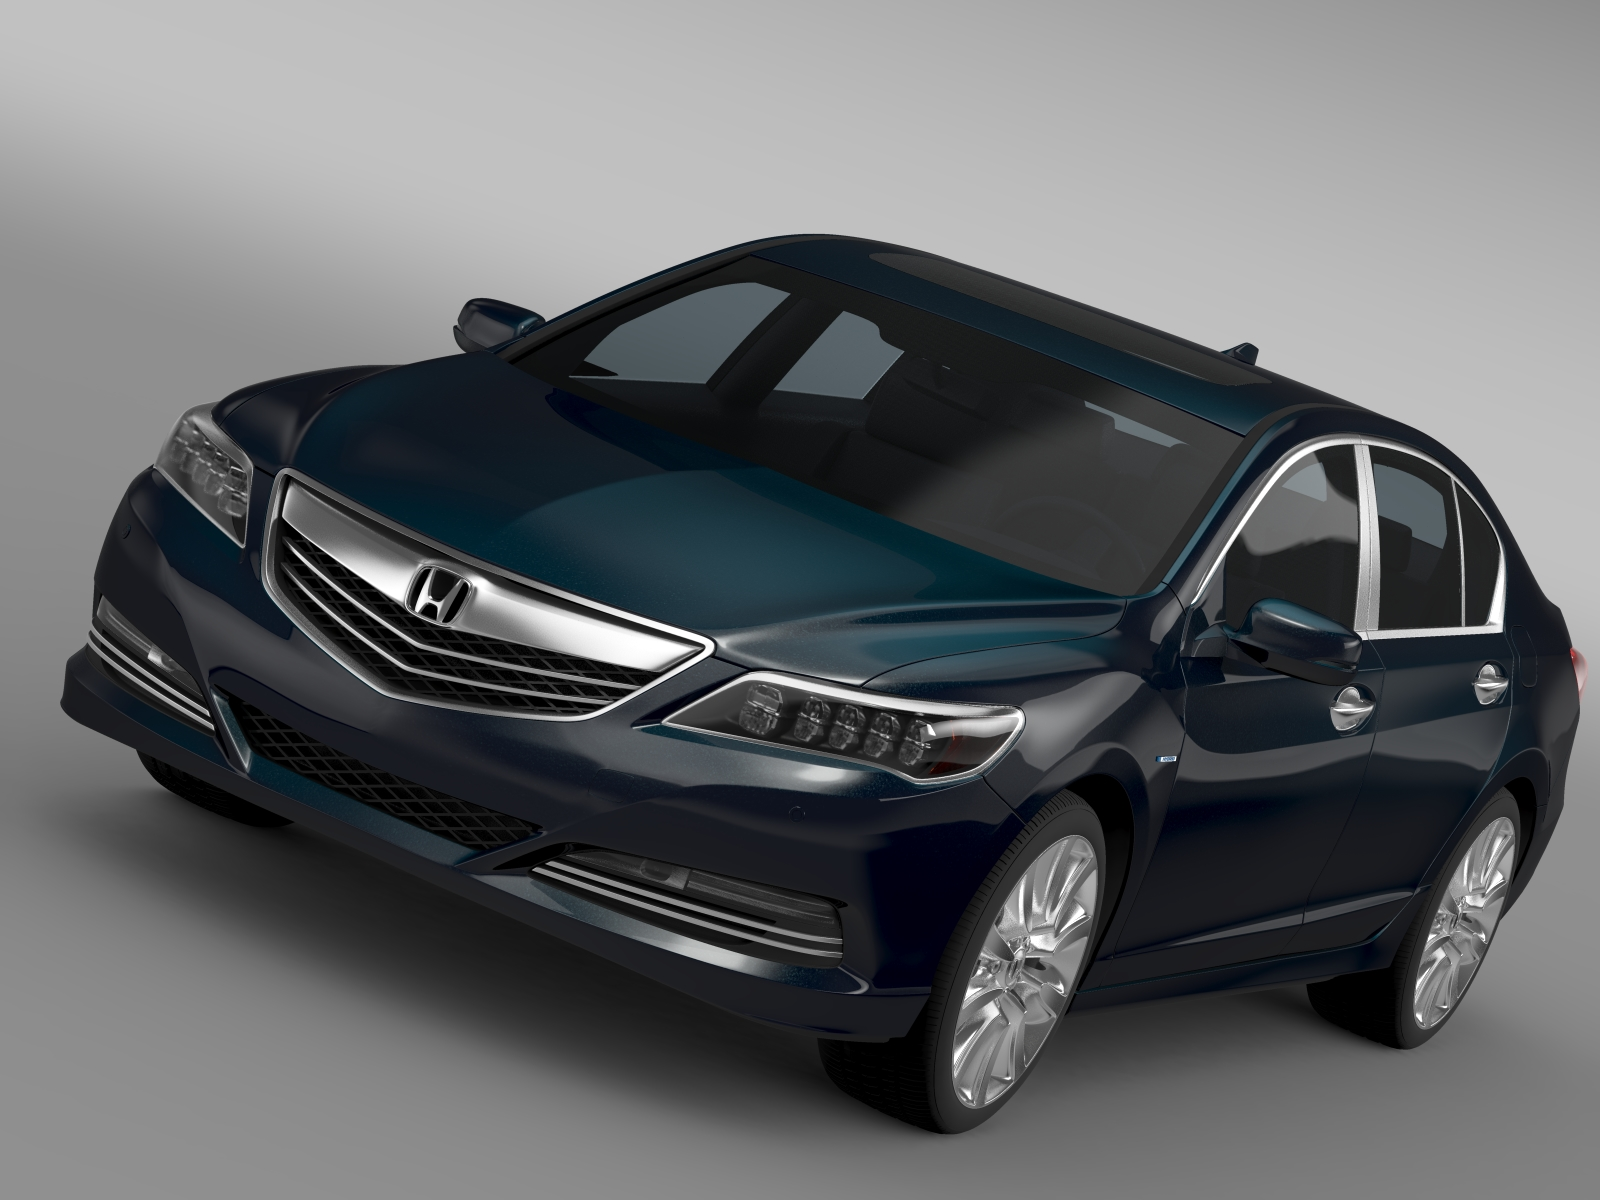 honda legend hybrid 2015 3d model 3ds max fbx c4d lwo ma mb hrc xsi obj 212523